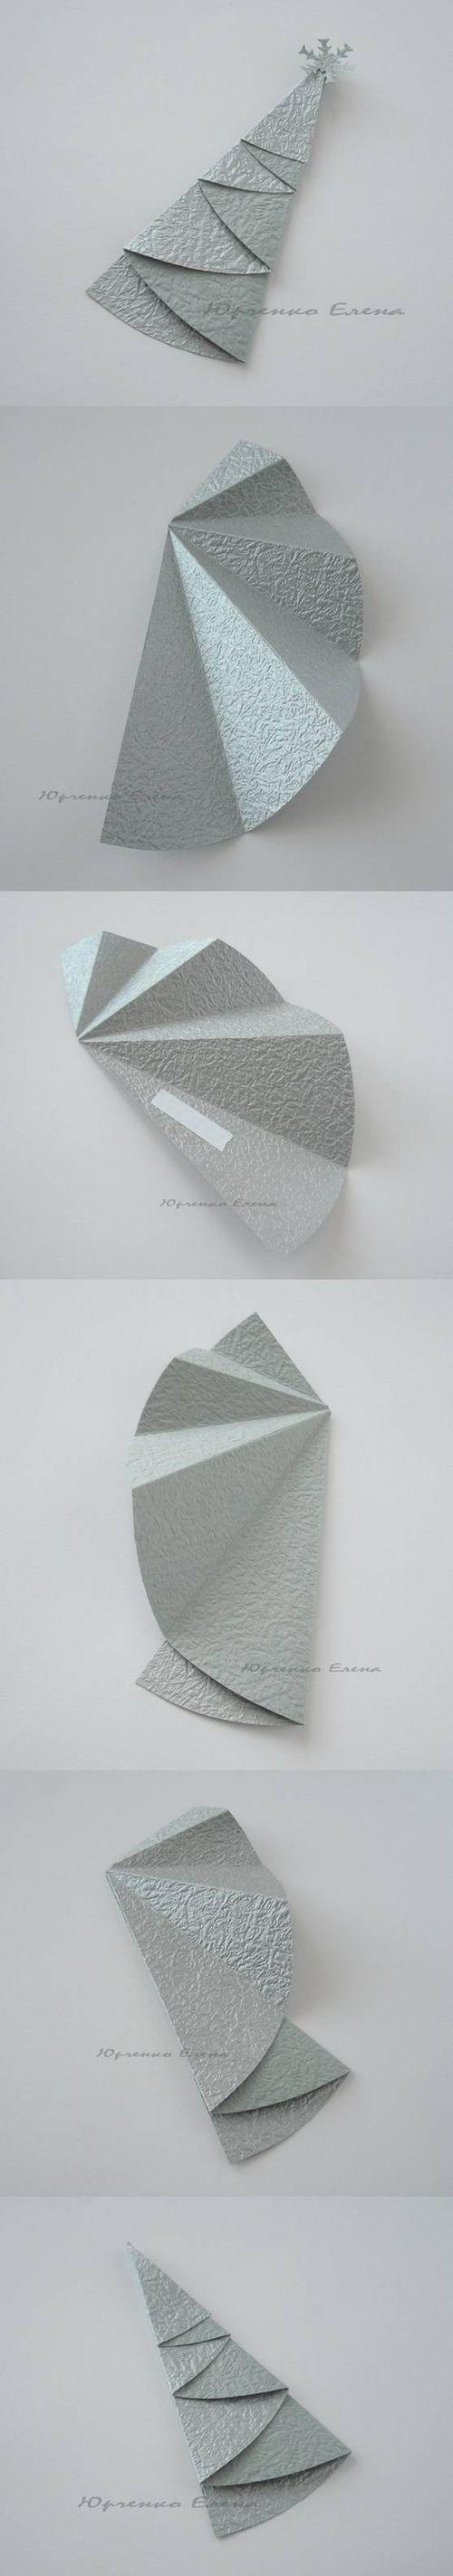 DIY Foldable Christmas Tree DIY Projects / UsefulDIY.com